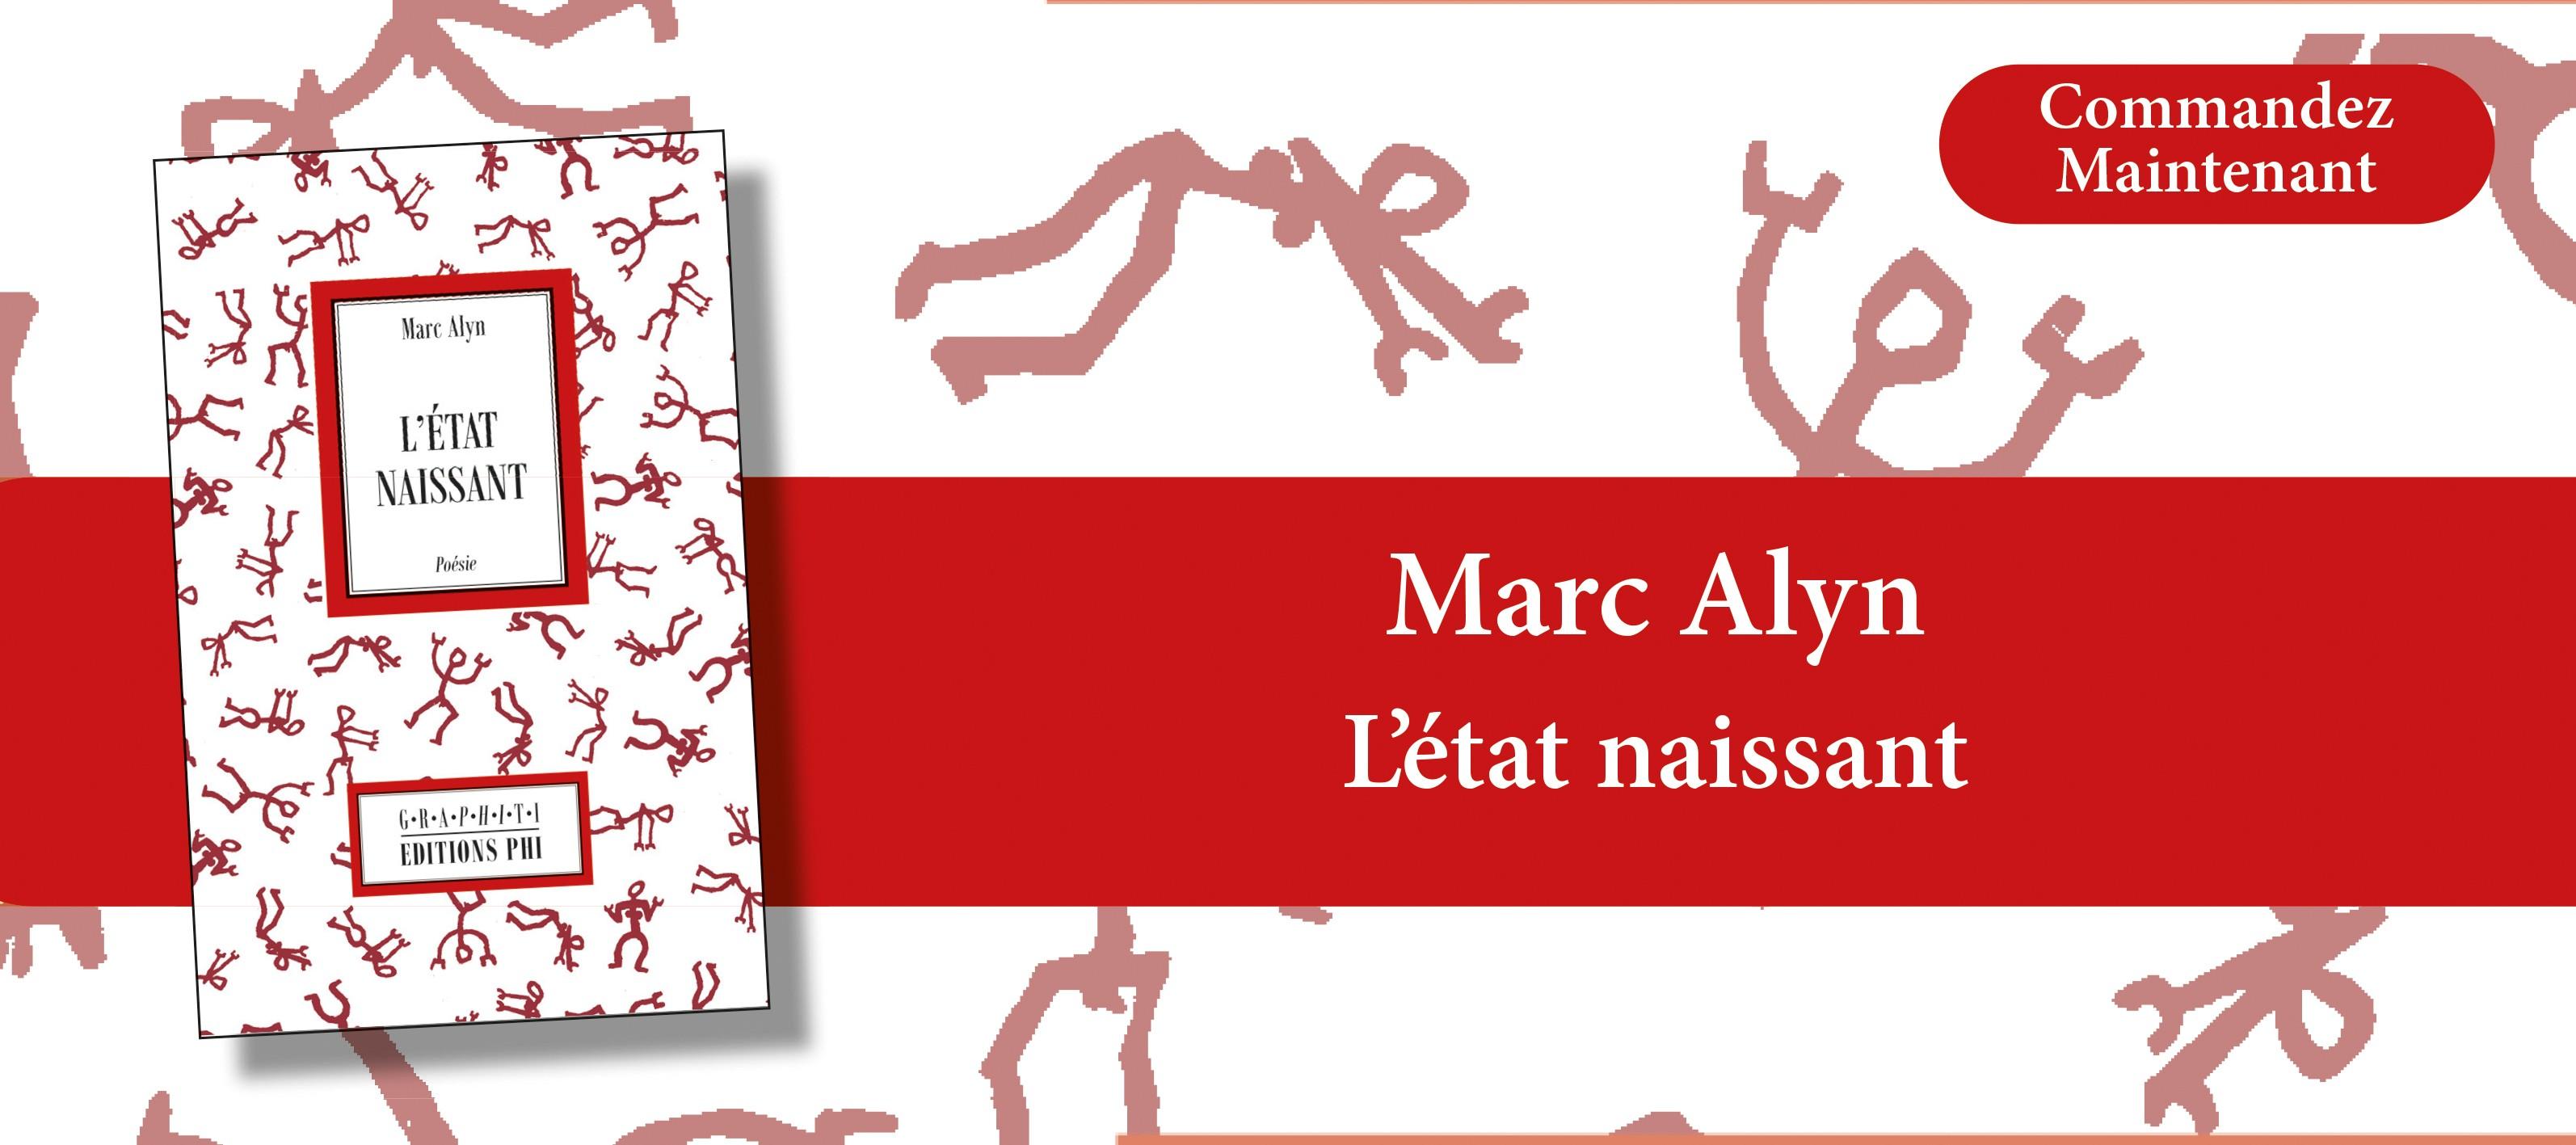 http://www.editionsphi.lu/fr/francais/503-marc-alyn-letat-naissant.html